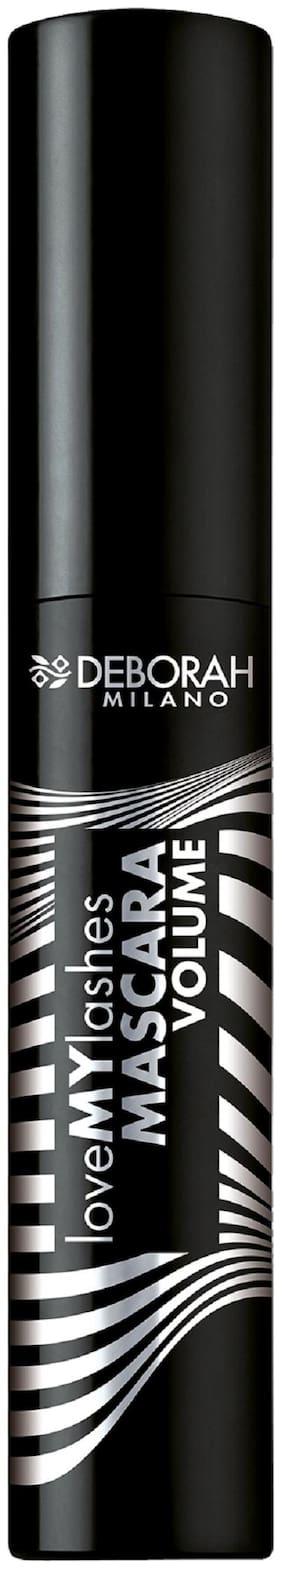 Deborah Milano LOVE MY LASHES Mascara - Volume - Black 13ml